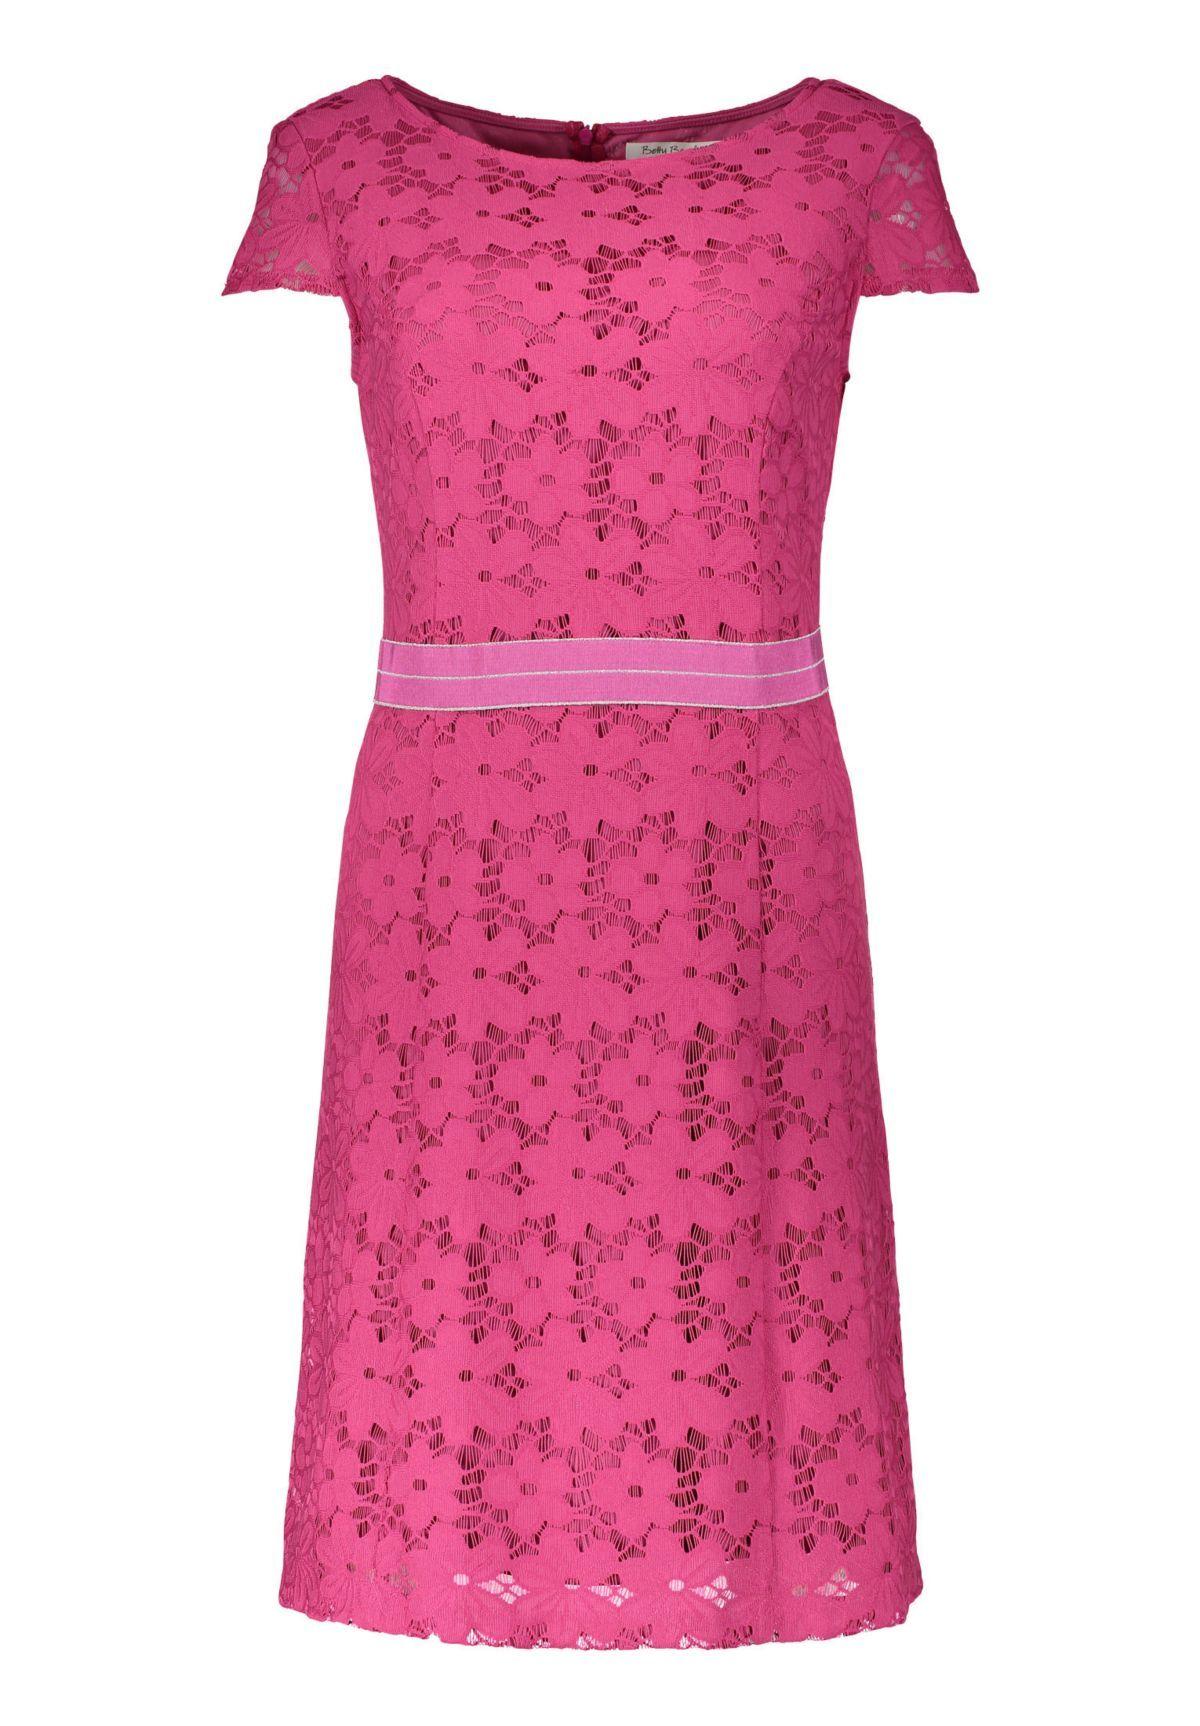 Betty Barclay Kleid aus Spitze   bb   Shirts 7972724fce